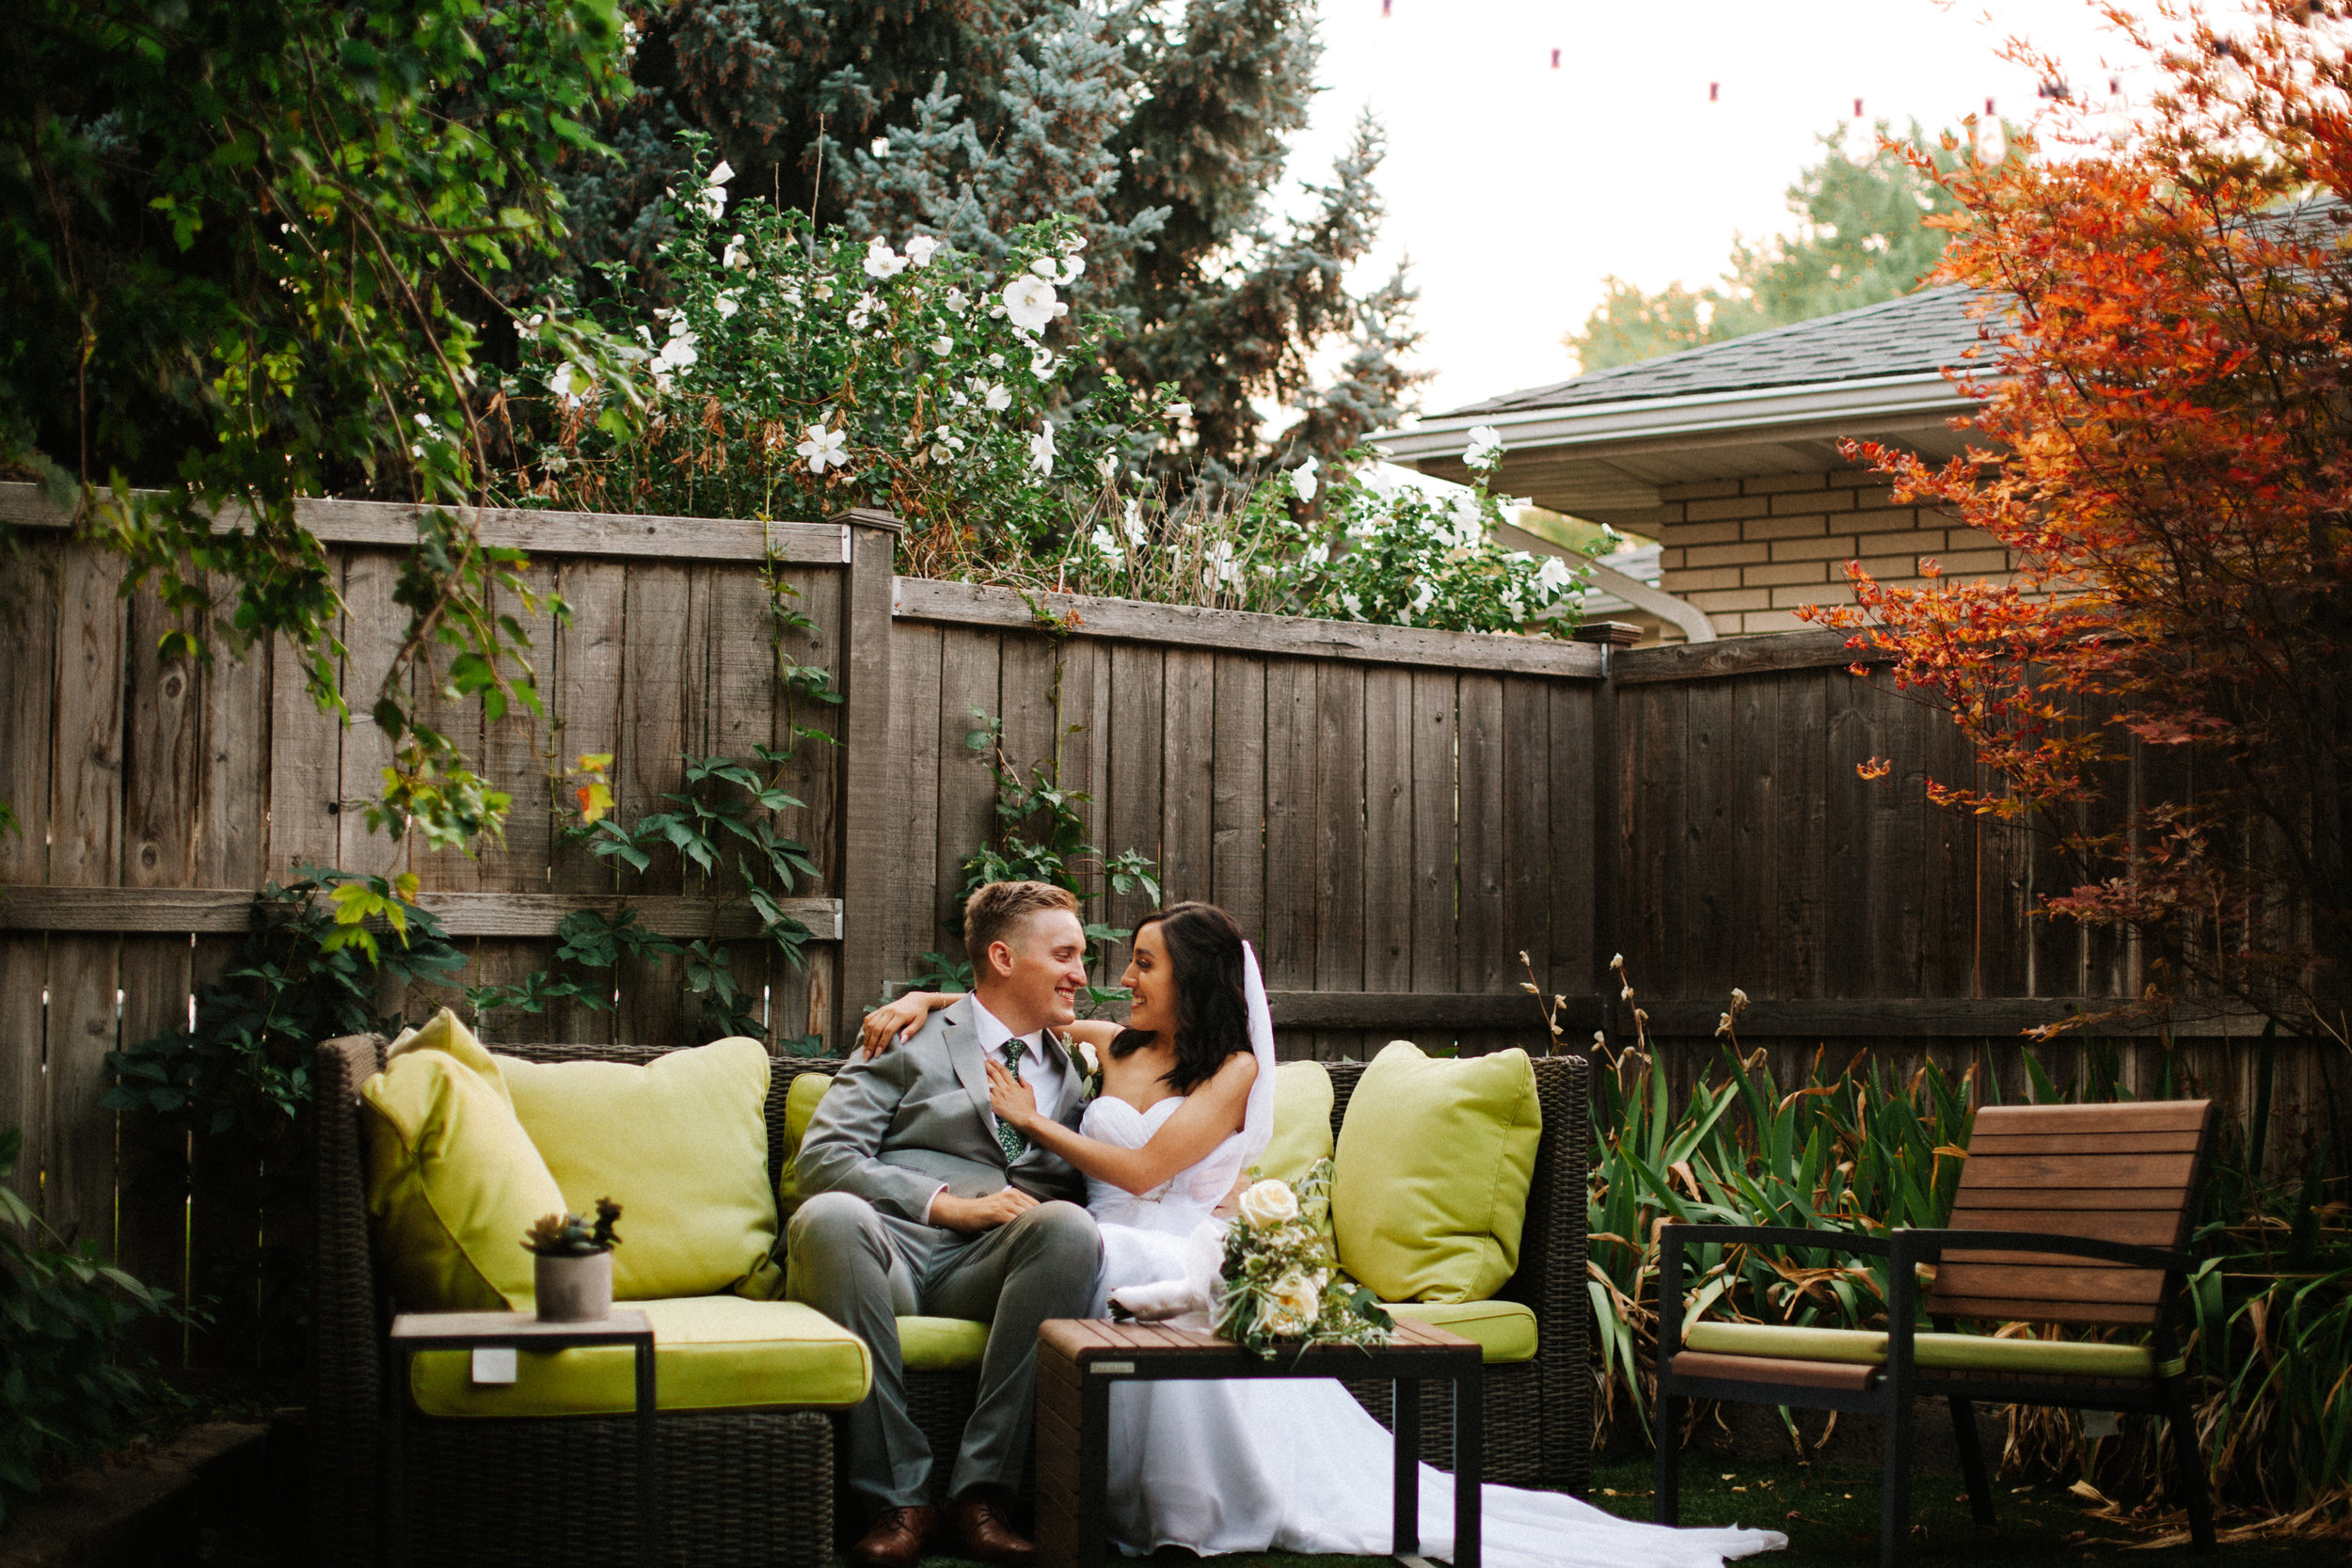 Salt Lake City Wedding - Salt Lake Wedding Photographer - Utah Wedding - Utah Wedding Photographer - SLC Wedding - SLC Wedding Photos - Murray UT Wedding-9919.jpg